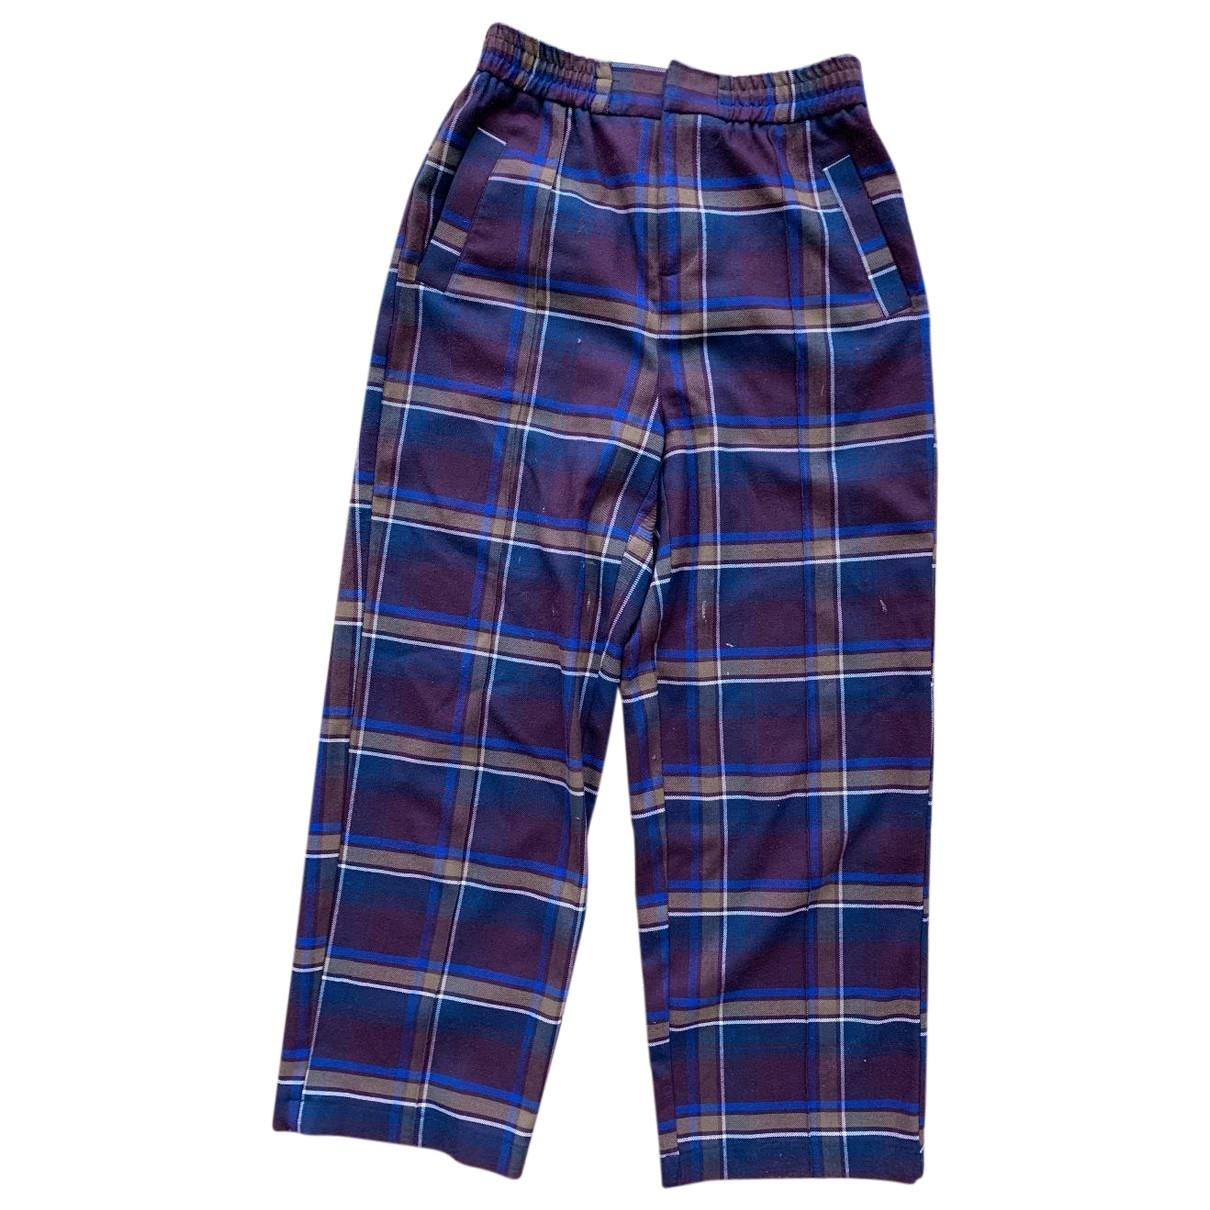 Pantalon de traje Urban Outfitters